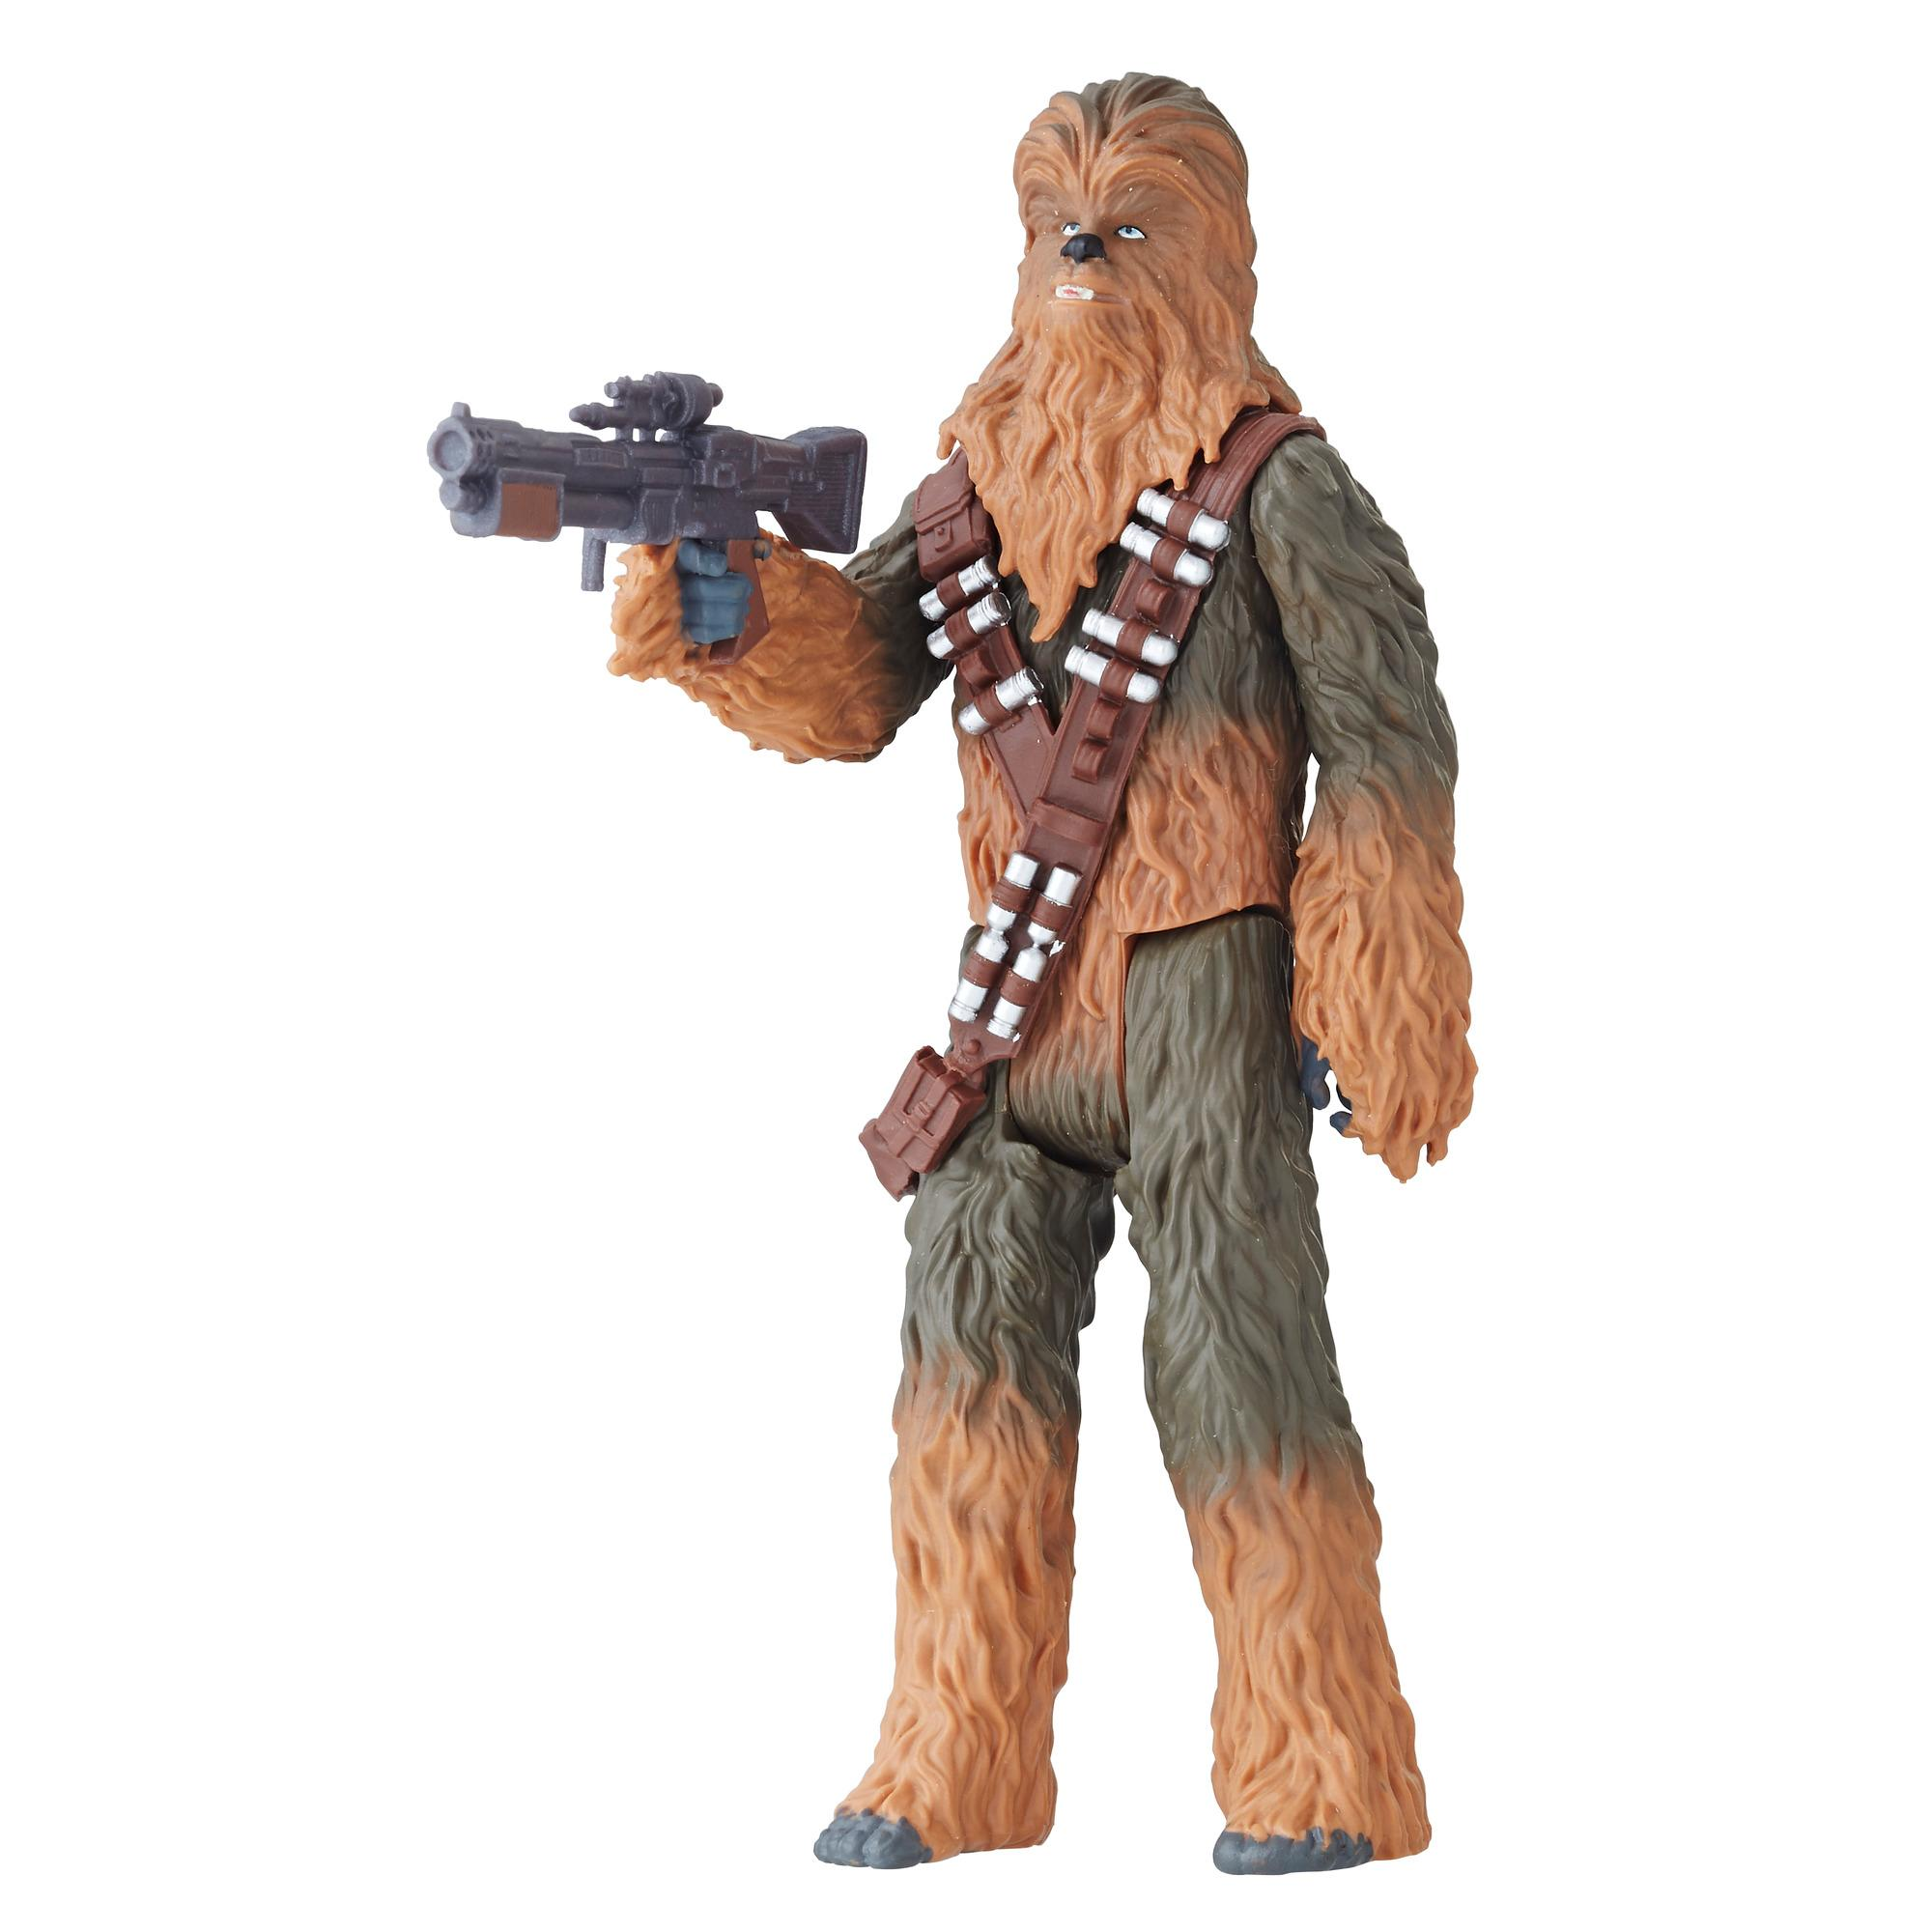 Star Wars Solo Film 3.75 FORCE LINK 2.0 Figur Chewbacca